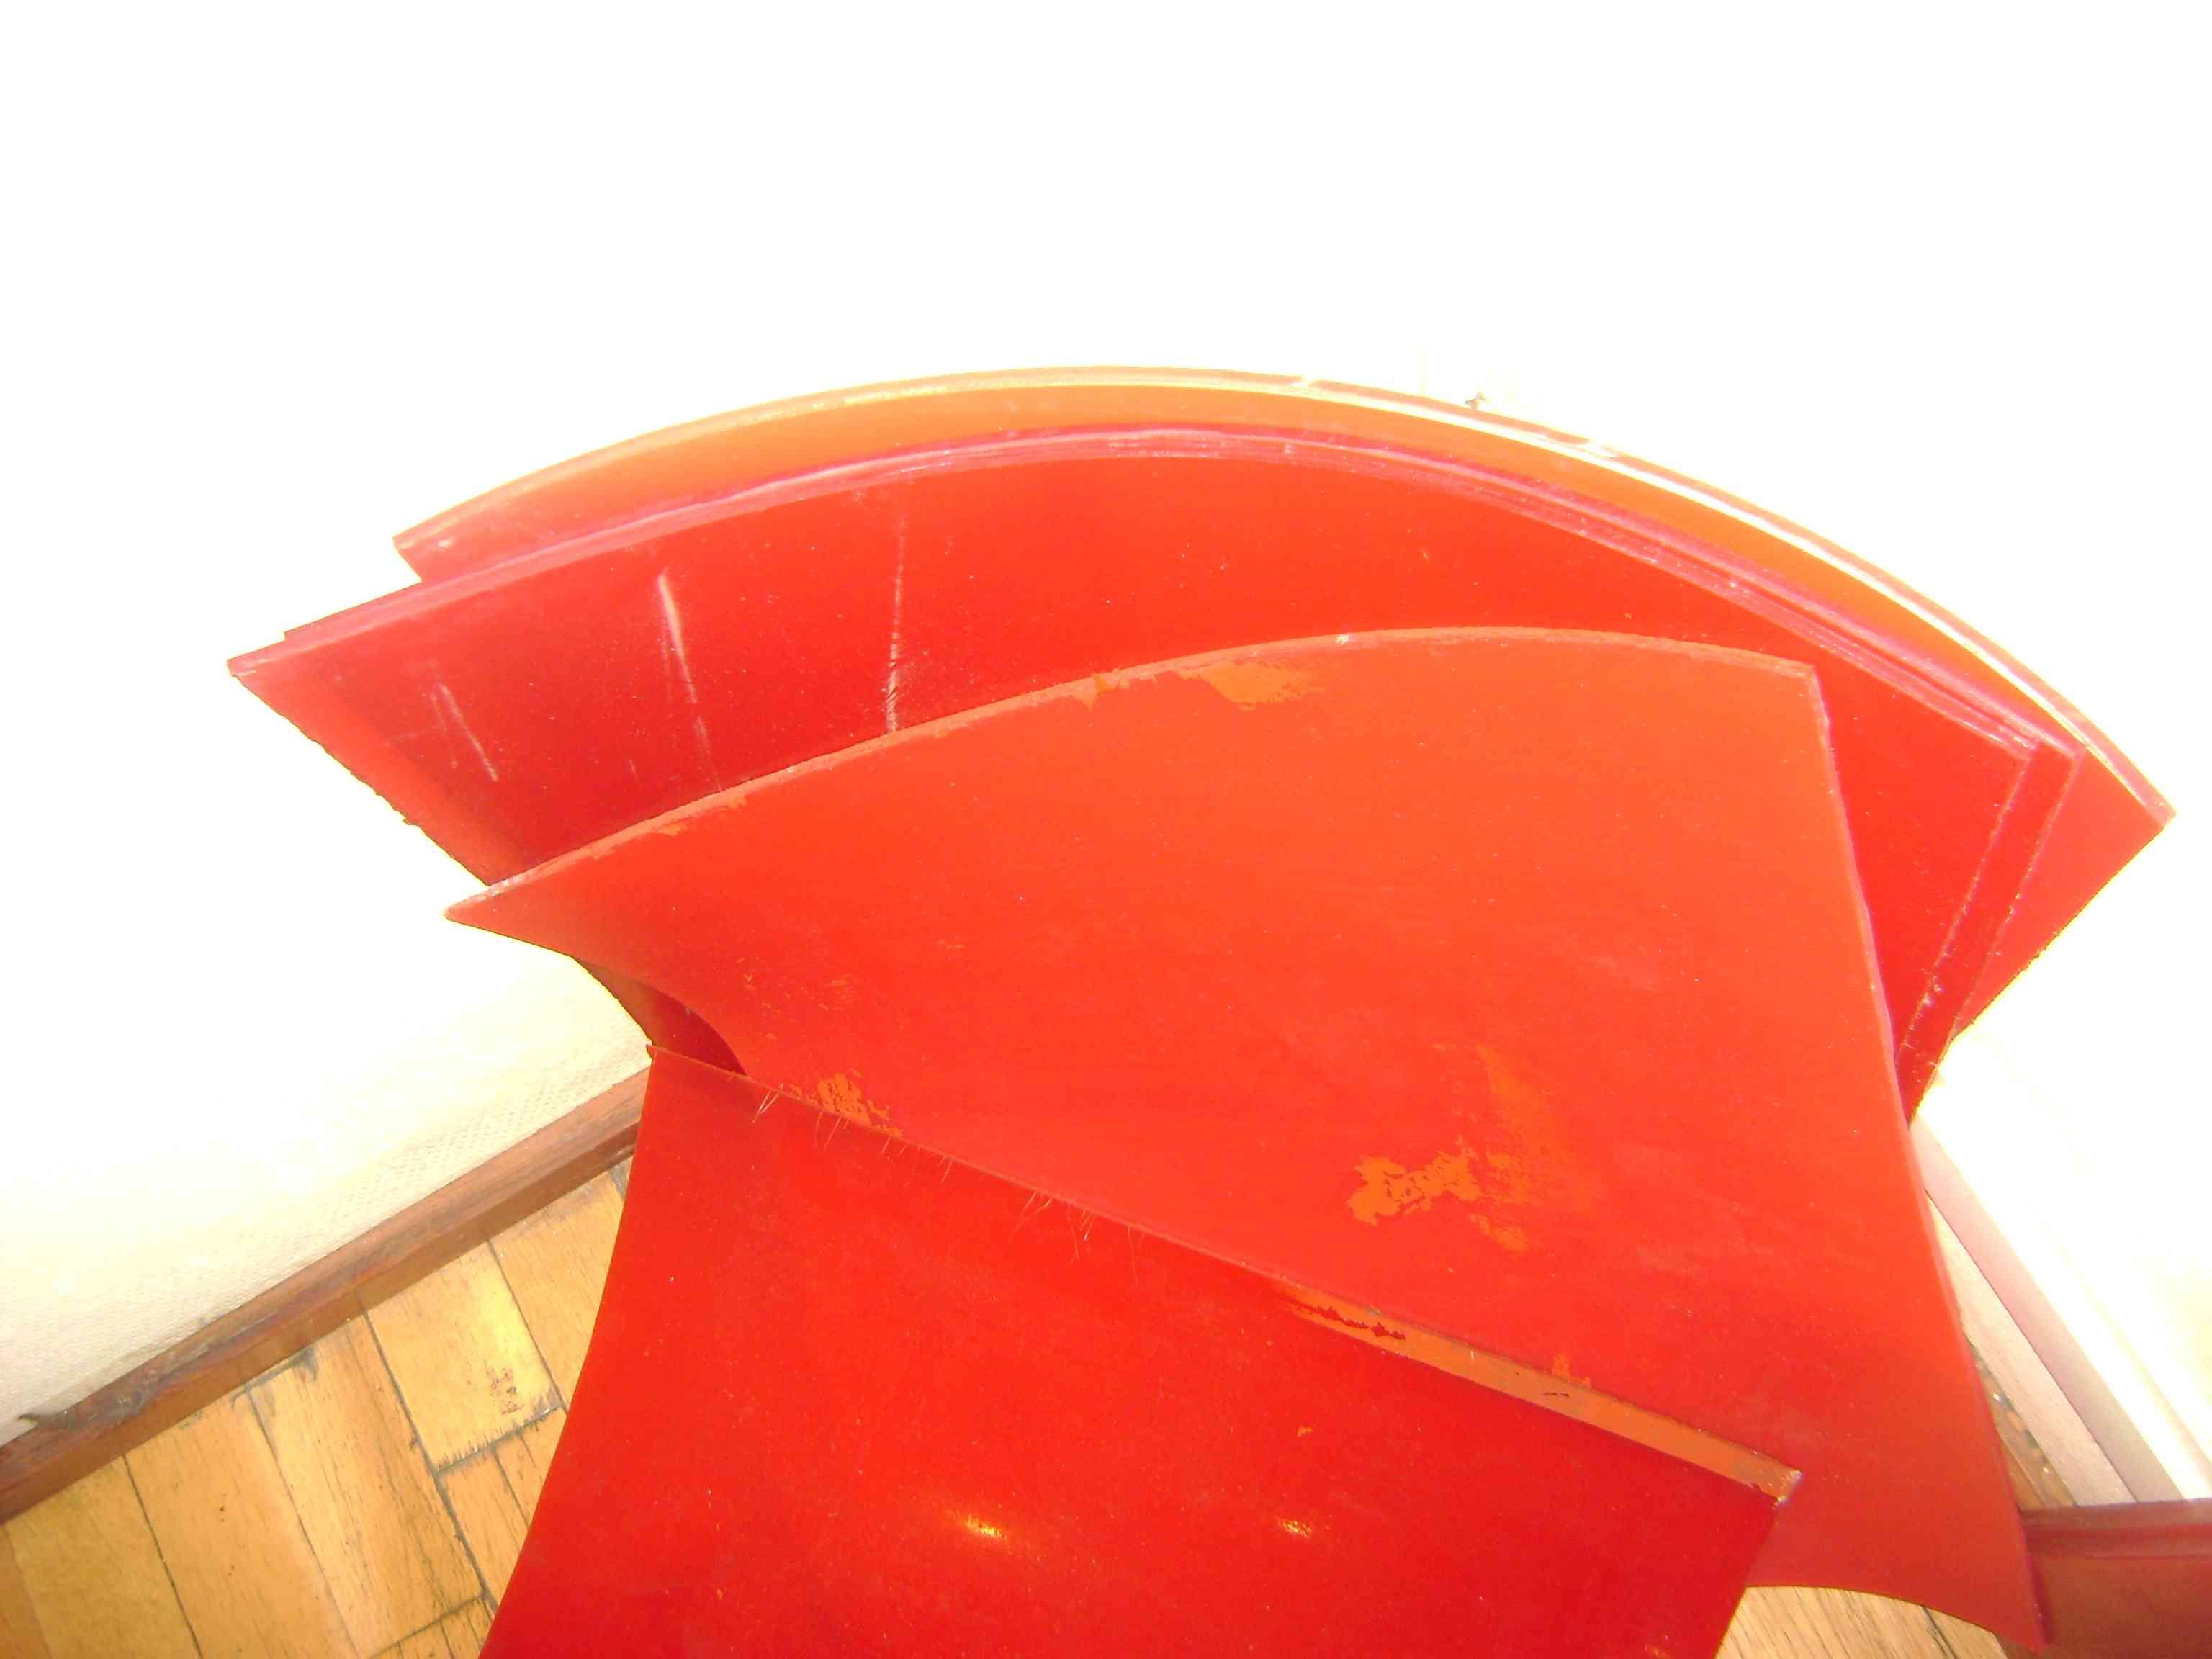 Пластина полиуретановая 500х500х25 мм Твердость 85-90 ед Шор